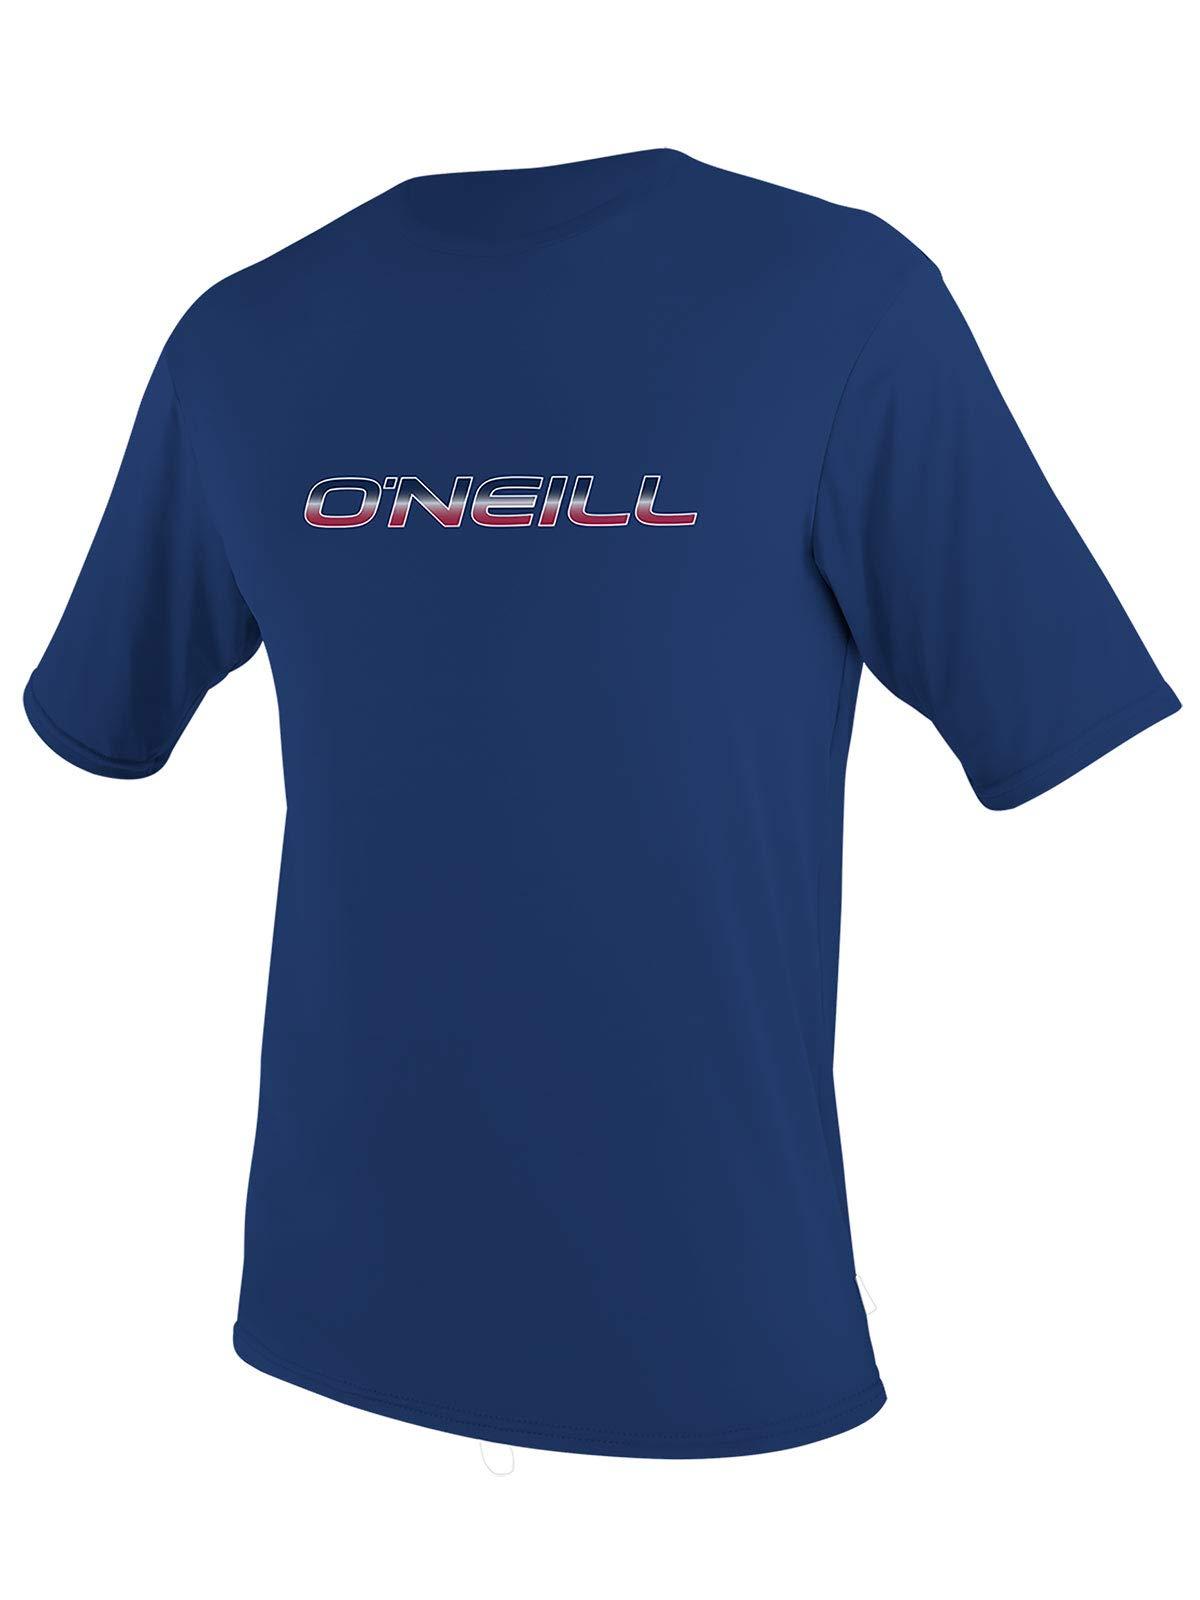 O'Neill Kids Basic Shortsleeve sunshirt 4 Navy (3422IS)